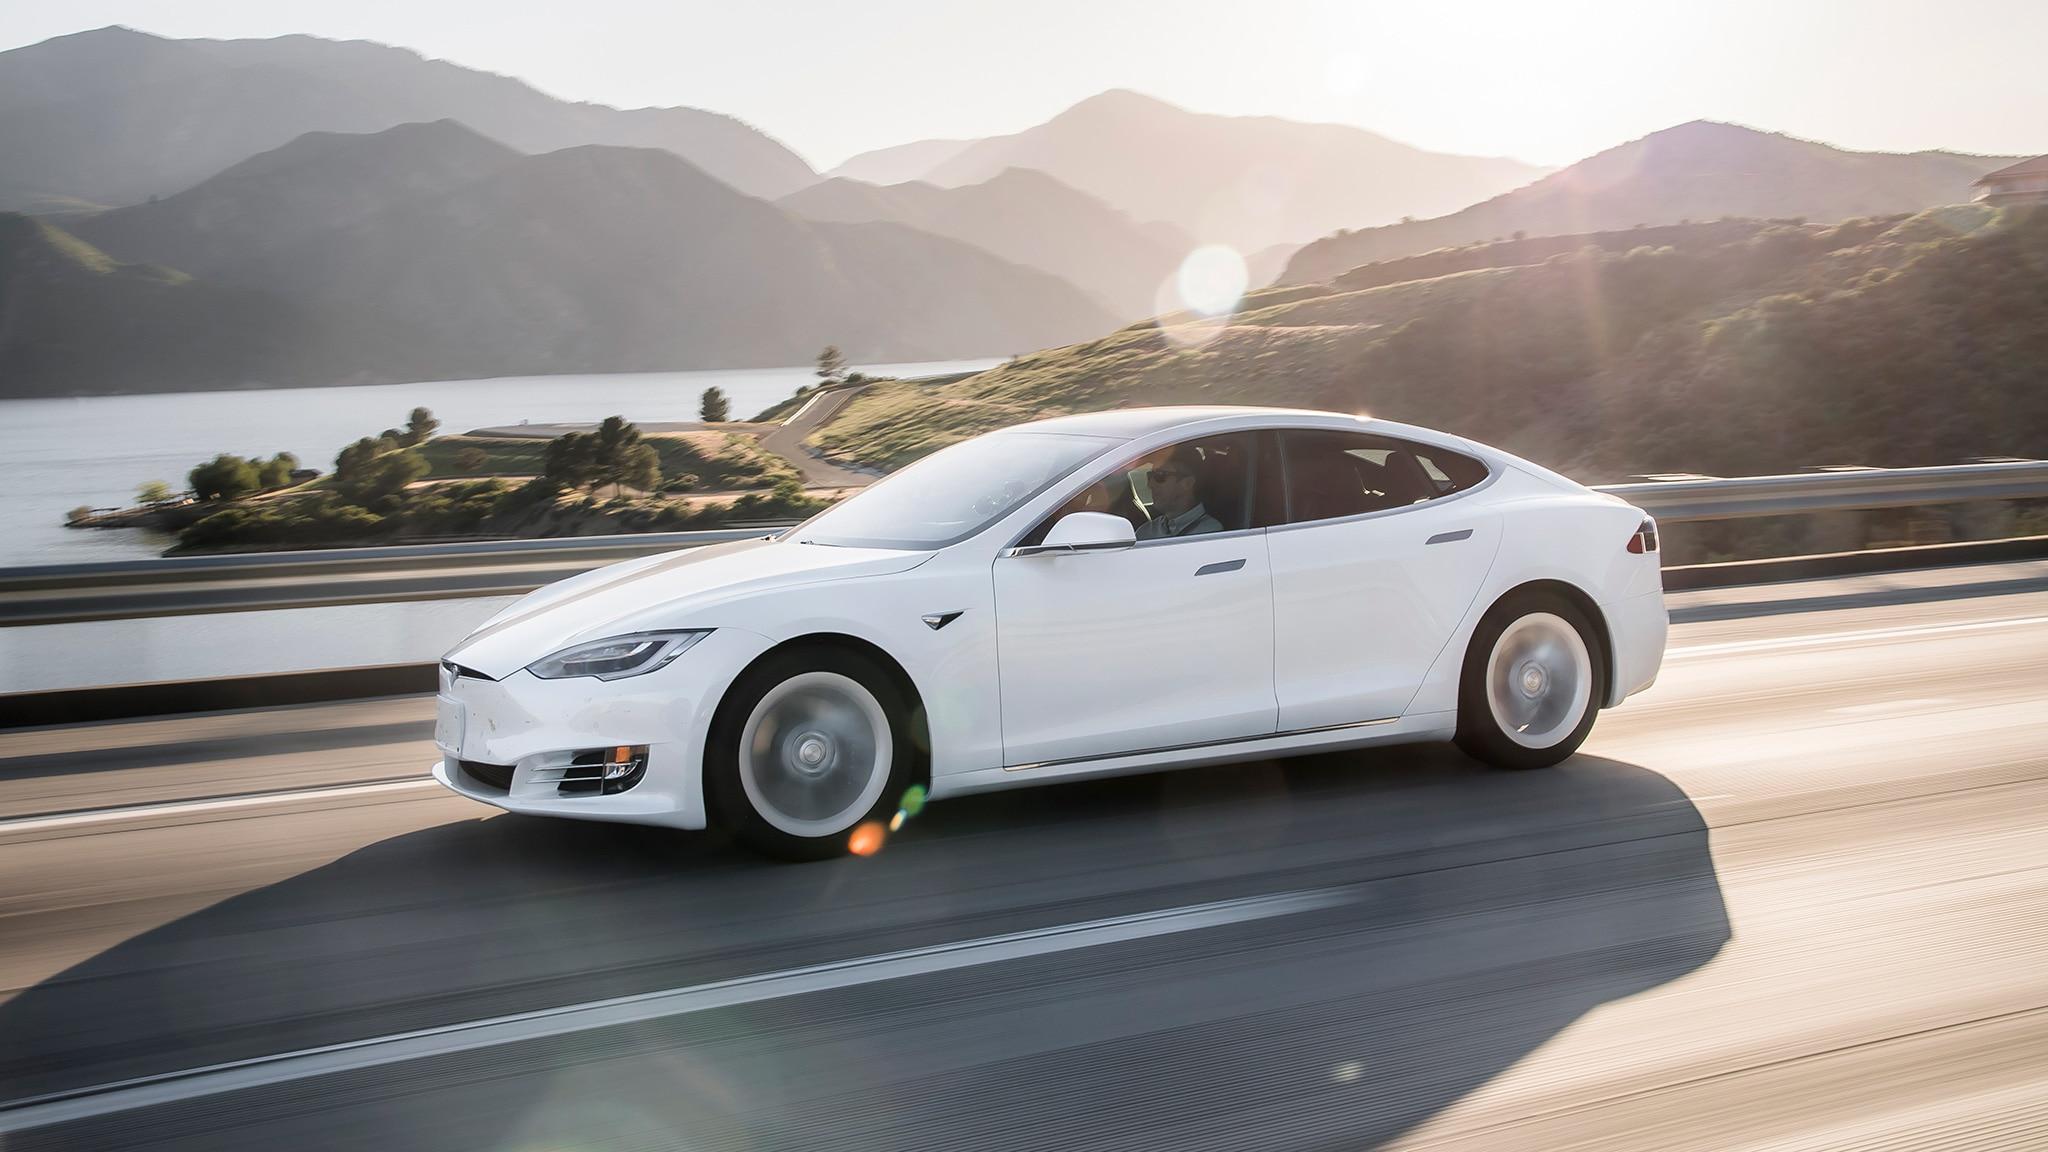 Tesla Model S Gets Major Updates to Range Charging and Performance 2048x1152